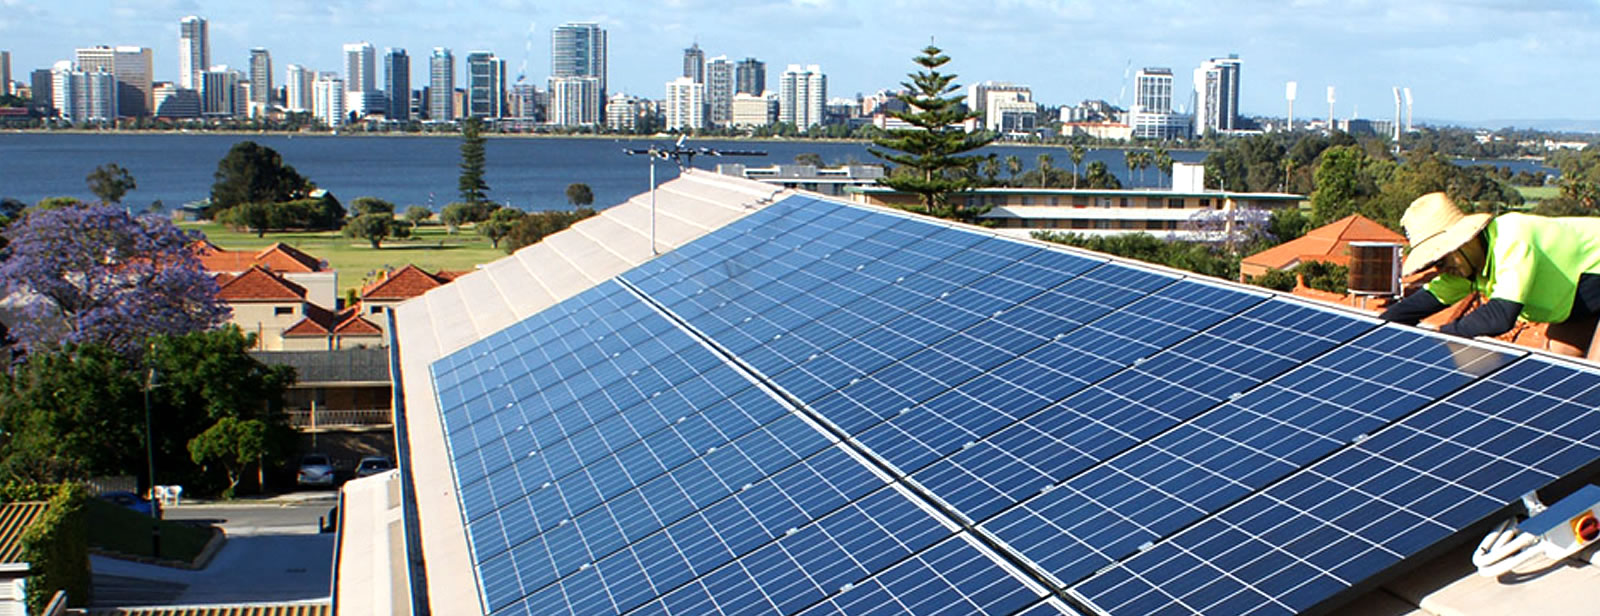 Solar Installation Image Perth western Australia